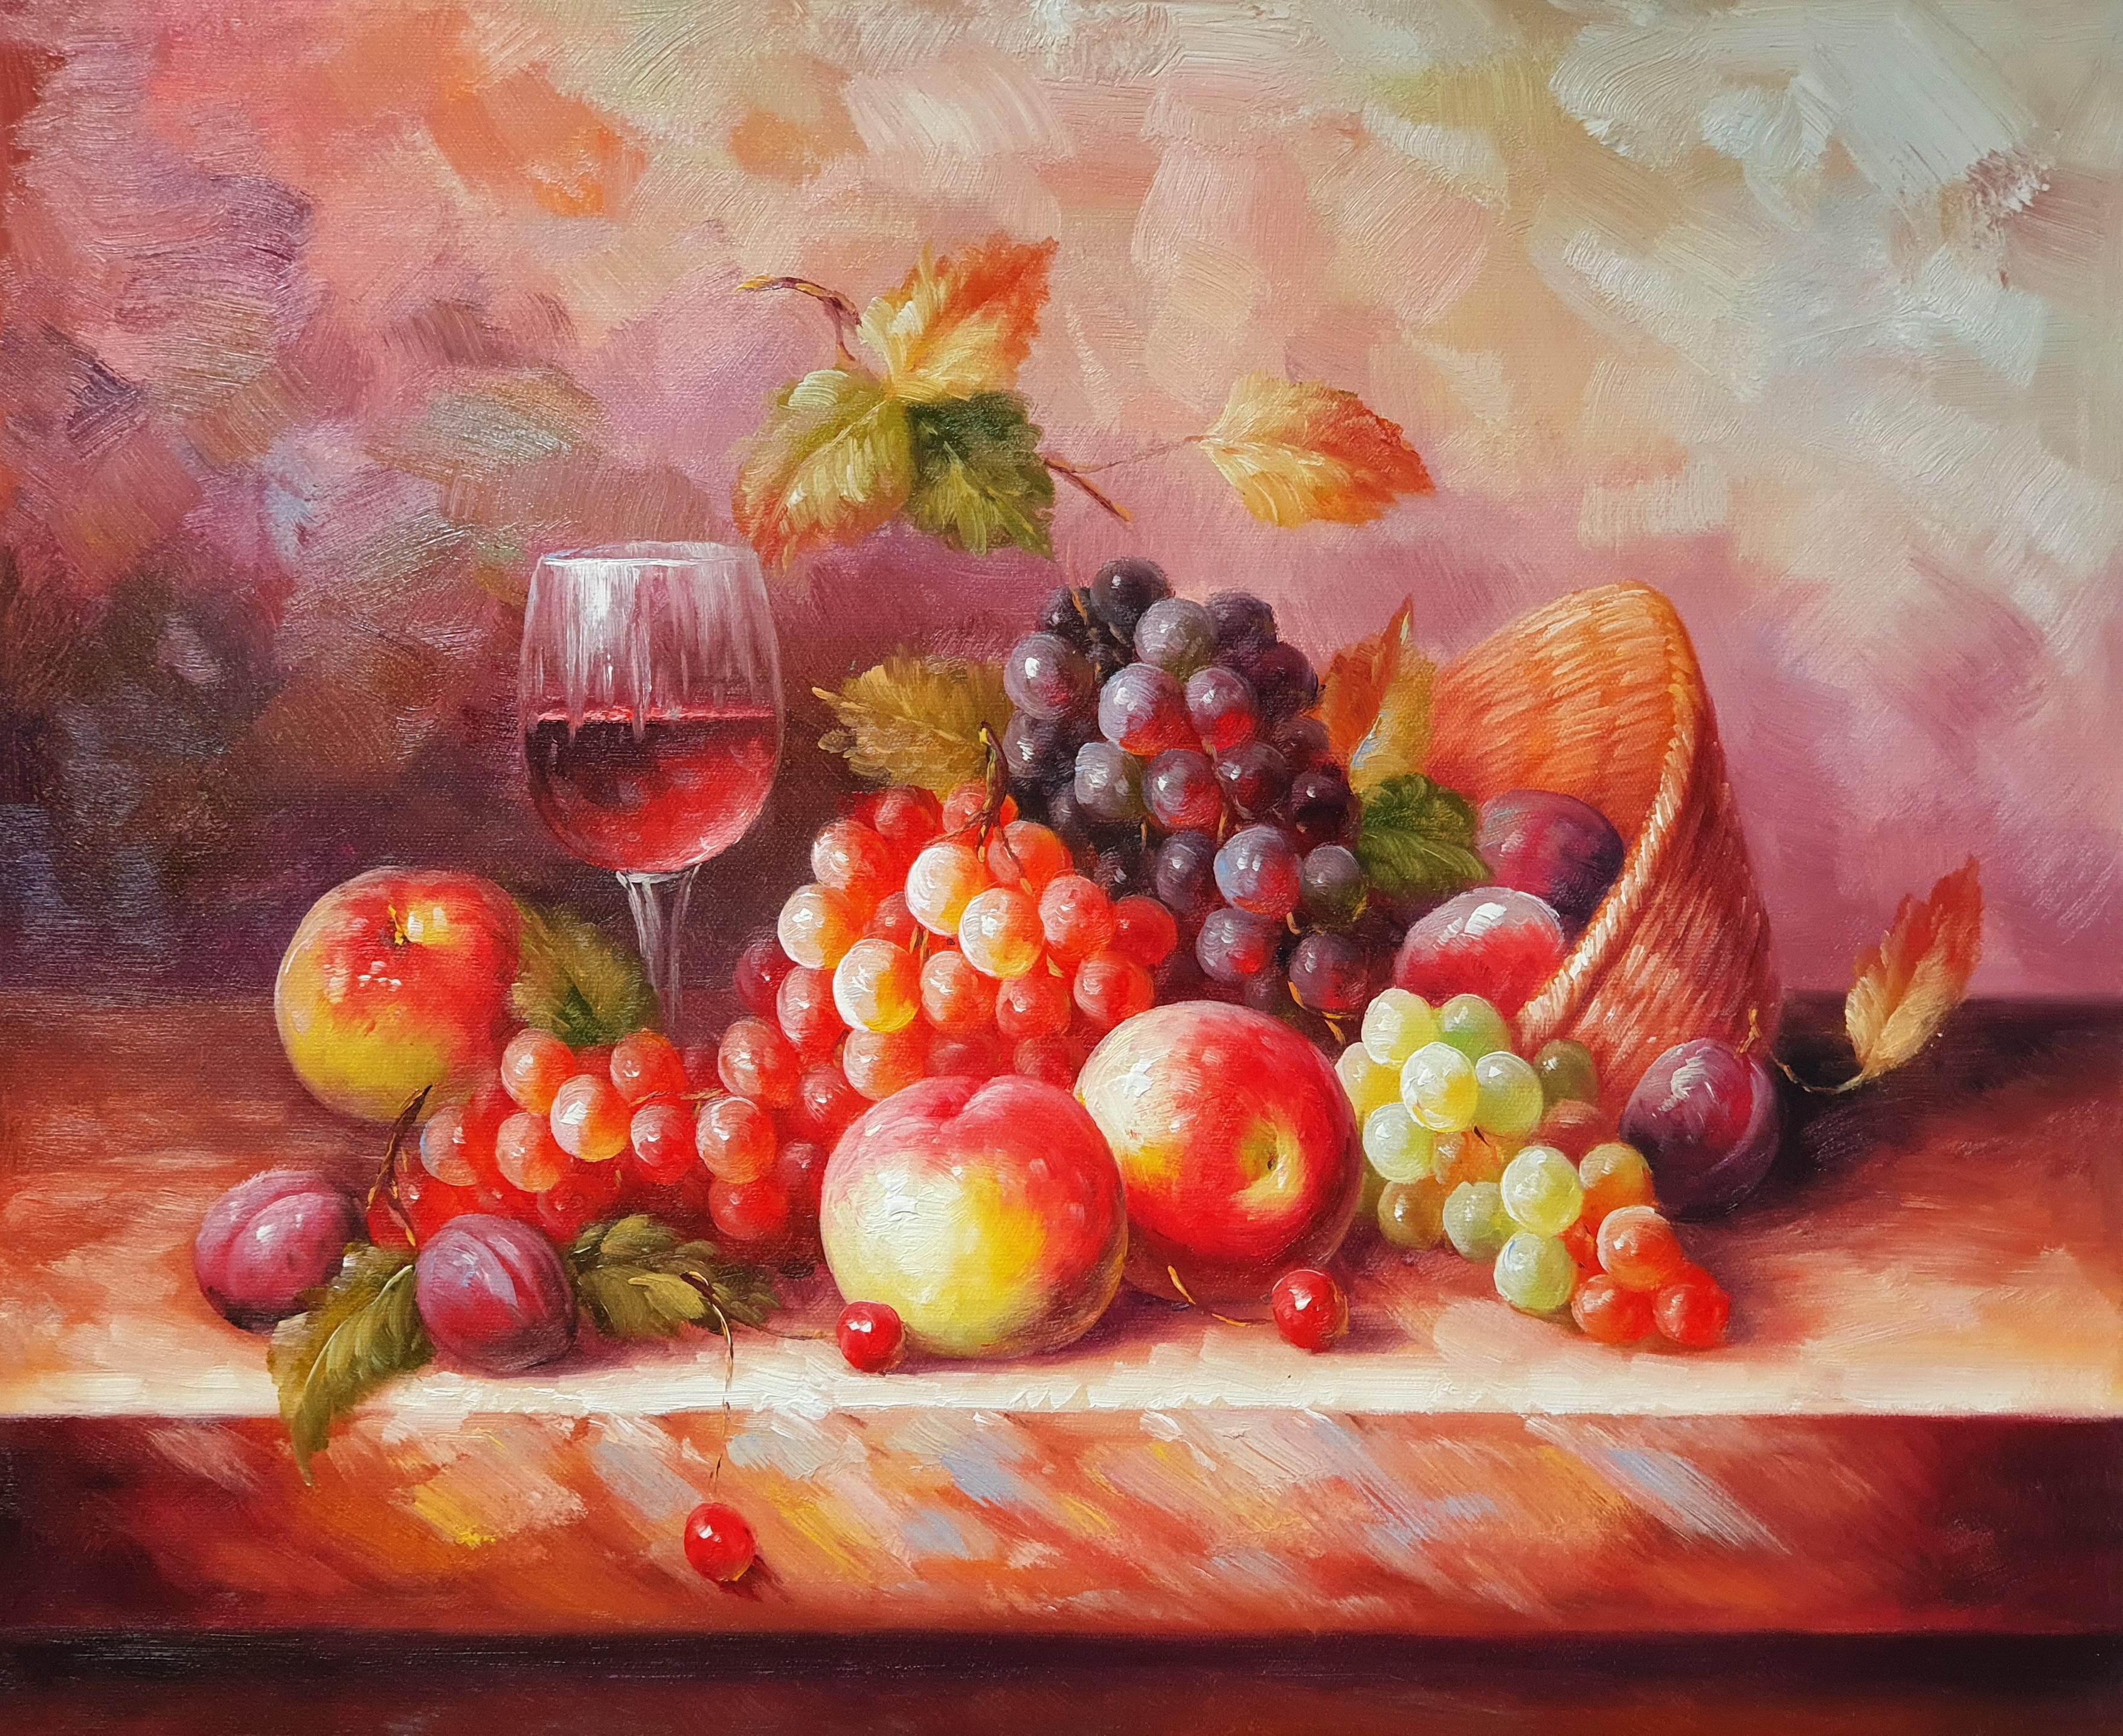 Натюрморт «Виноград и персики» картина 50х60 арт. 5Ц192